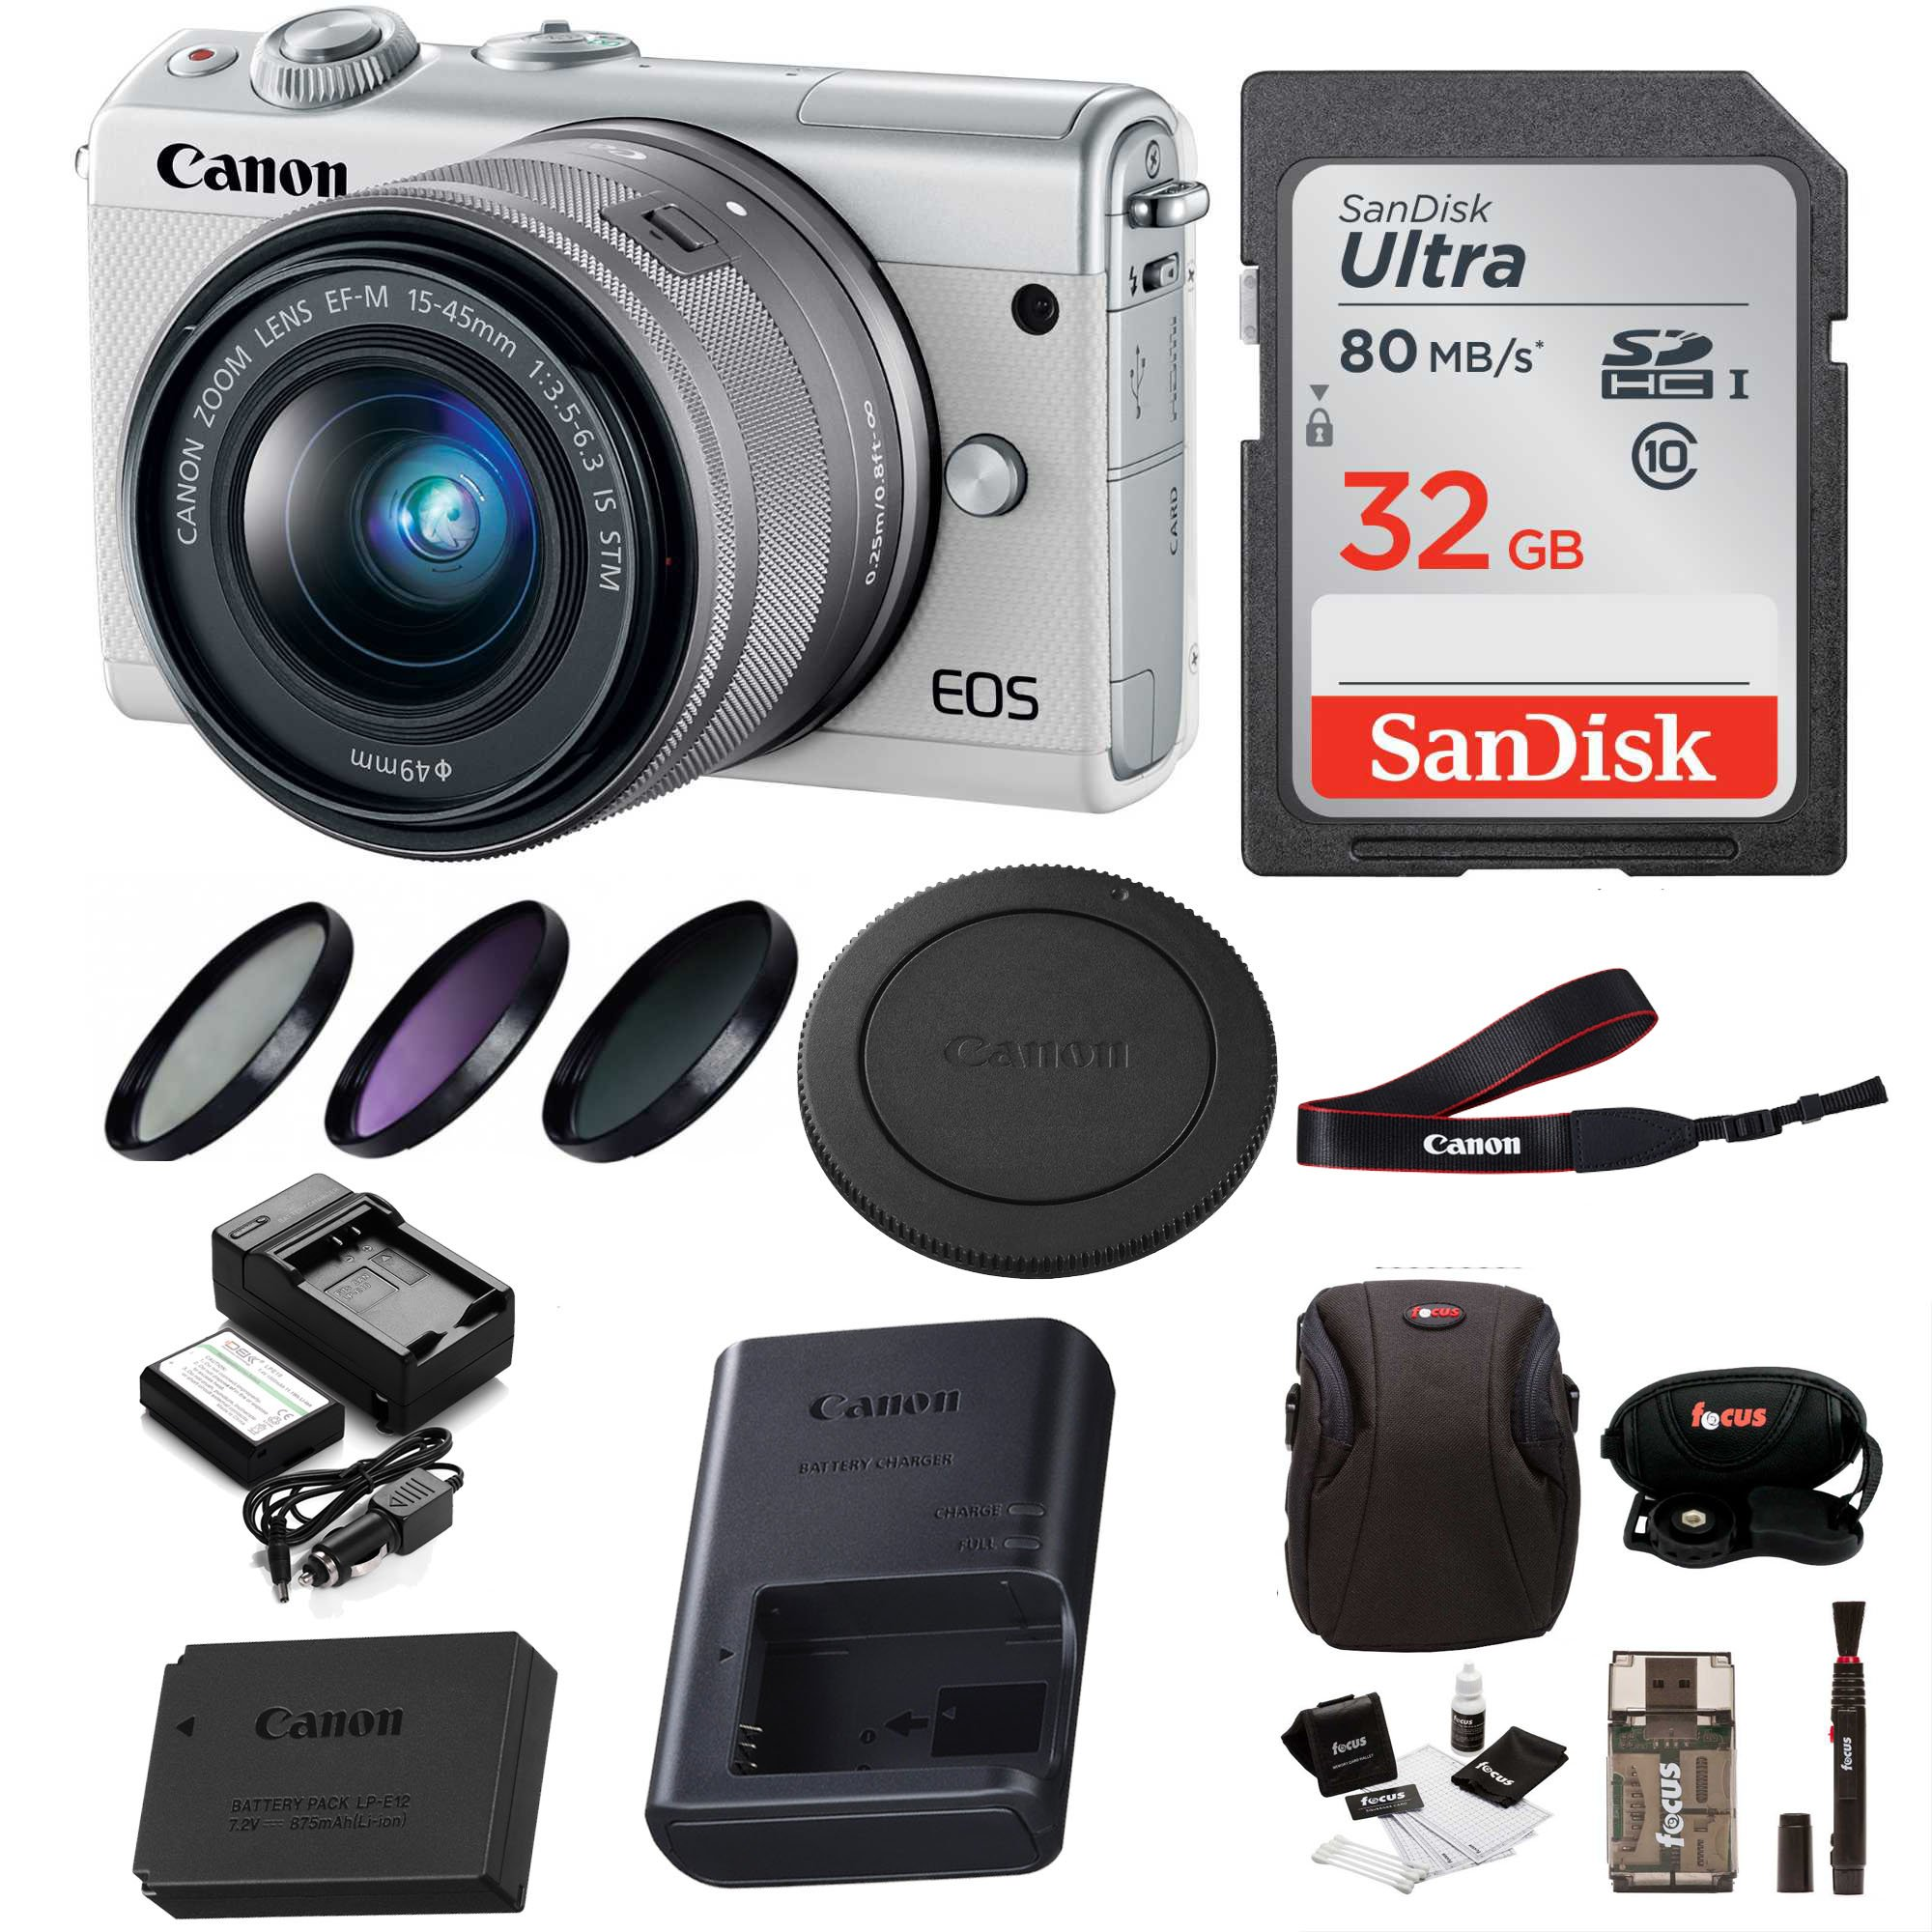 Canon EOS M100 Mirrorless Digital Camera EF-M 15-45mm lens (White) + 32GB Memory Card + Filter Kit + Bundle